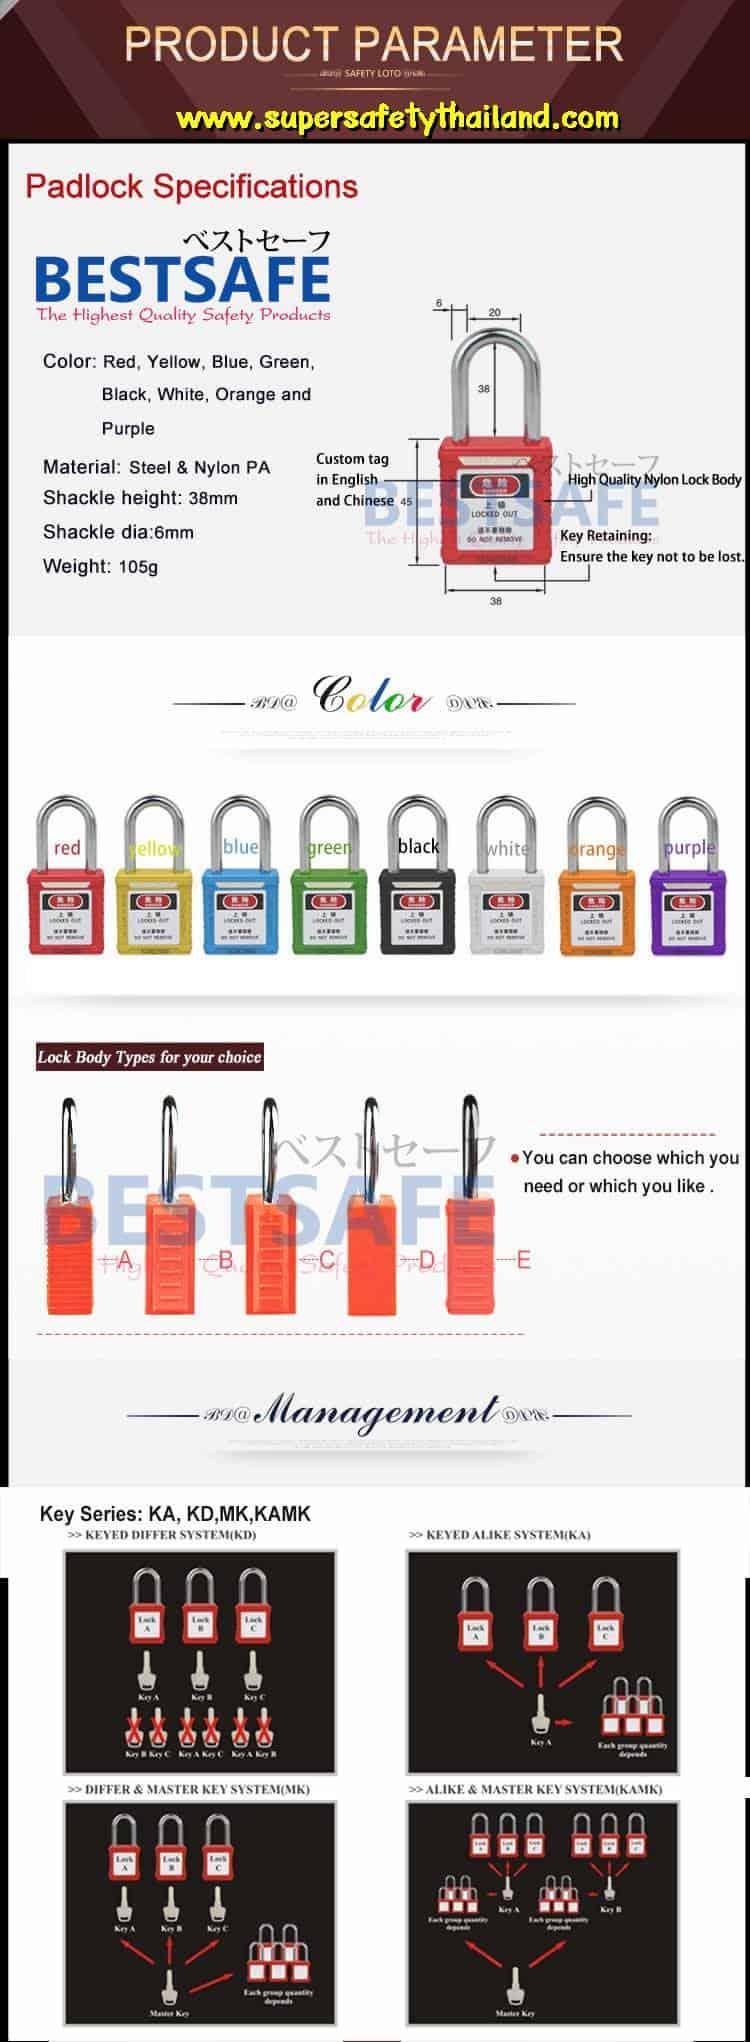 https://www.supersafetythailand.com/wp-content/uploads/2017/01/abs-safety-padlock-bd-g01-2.jpg